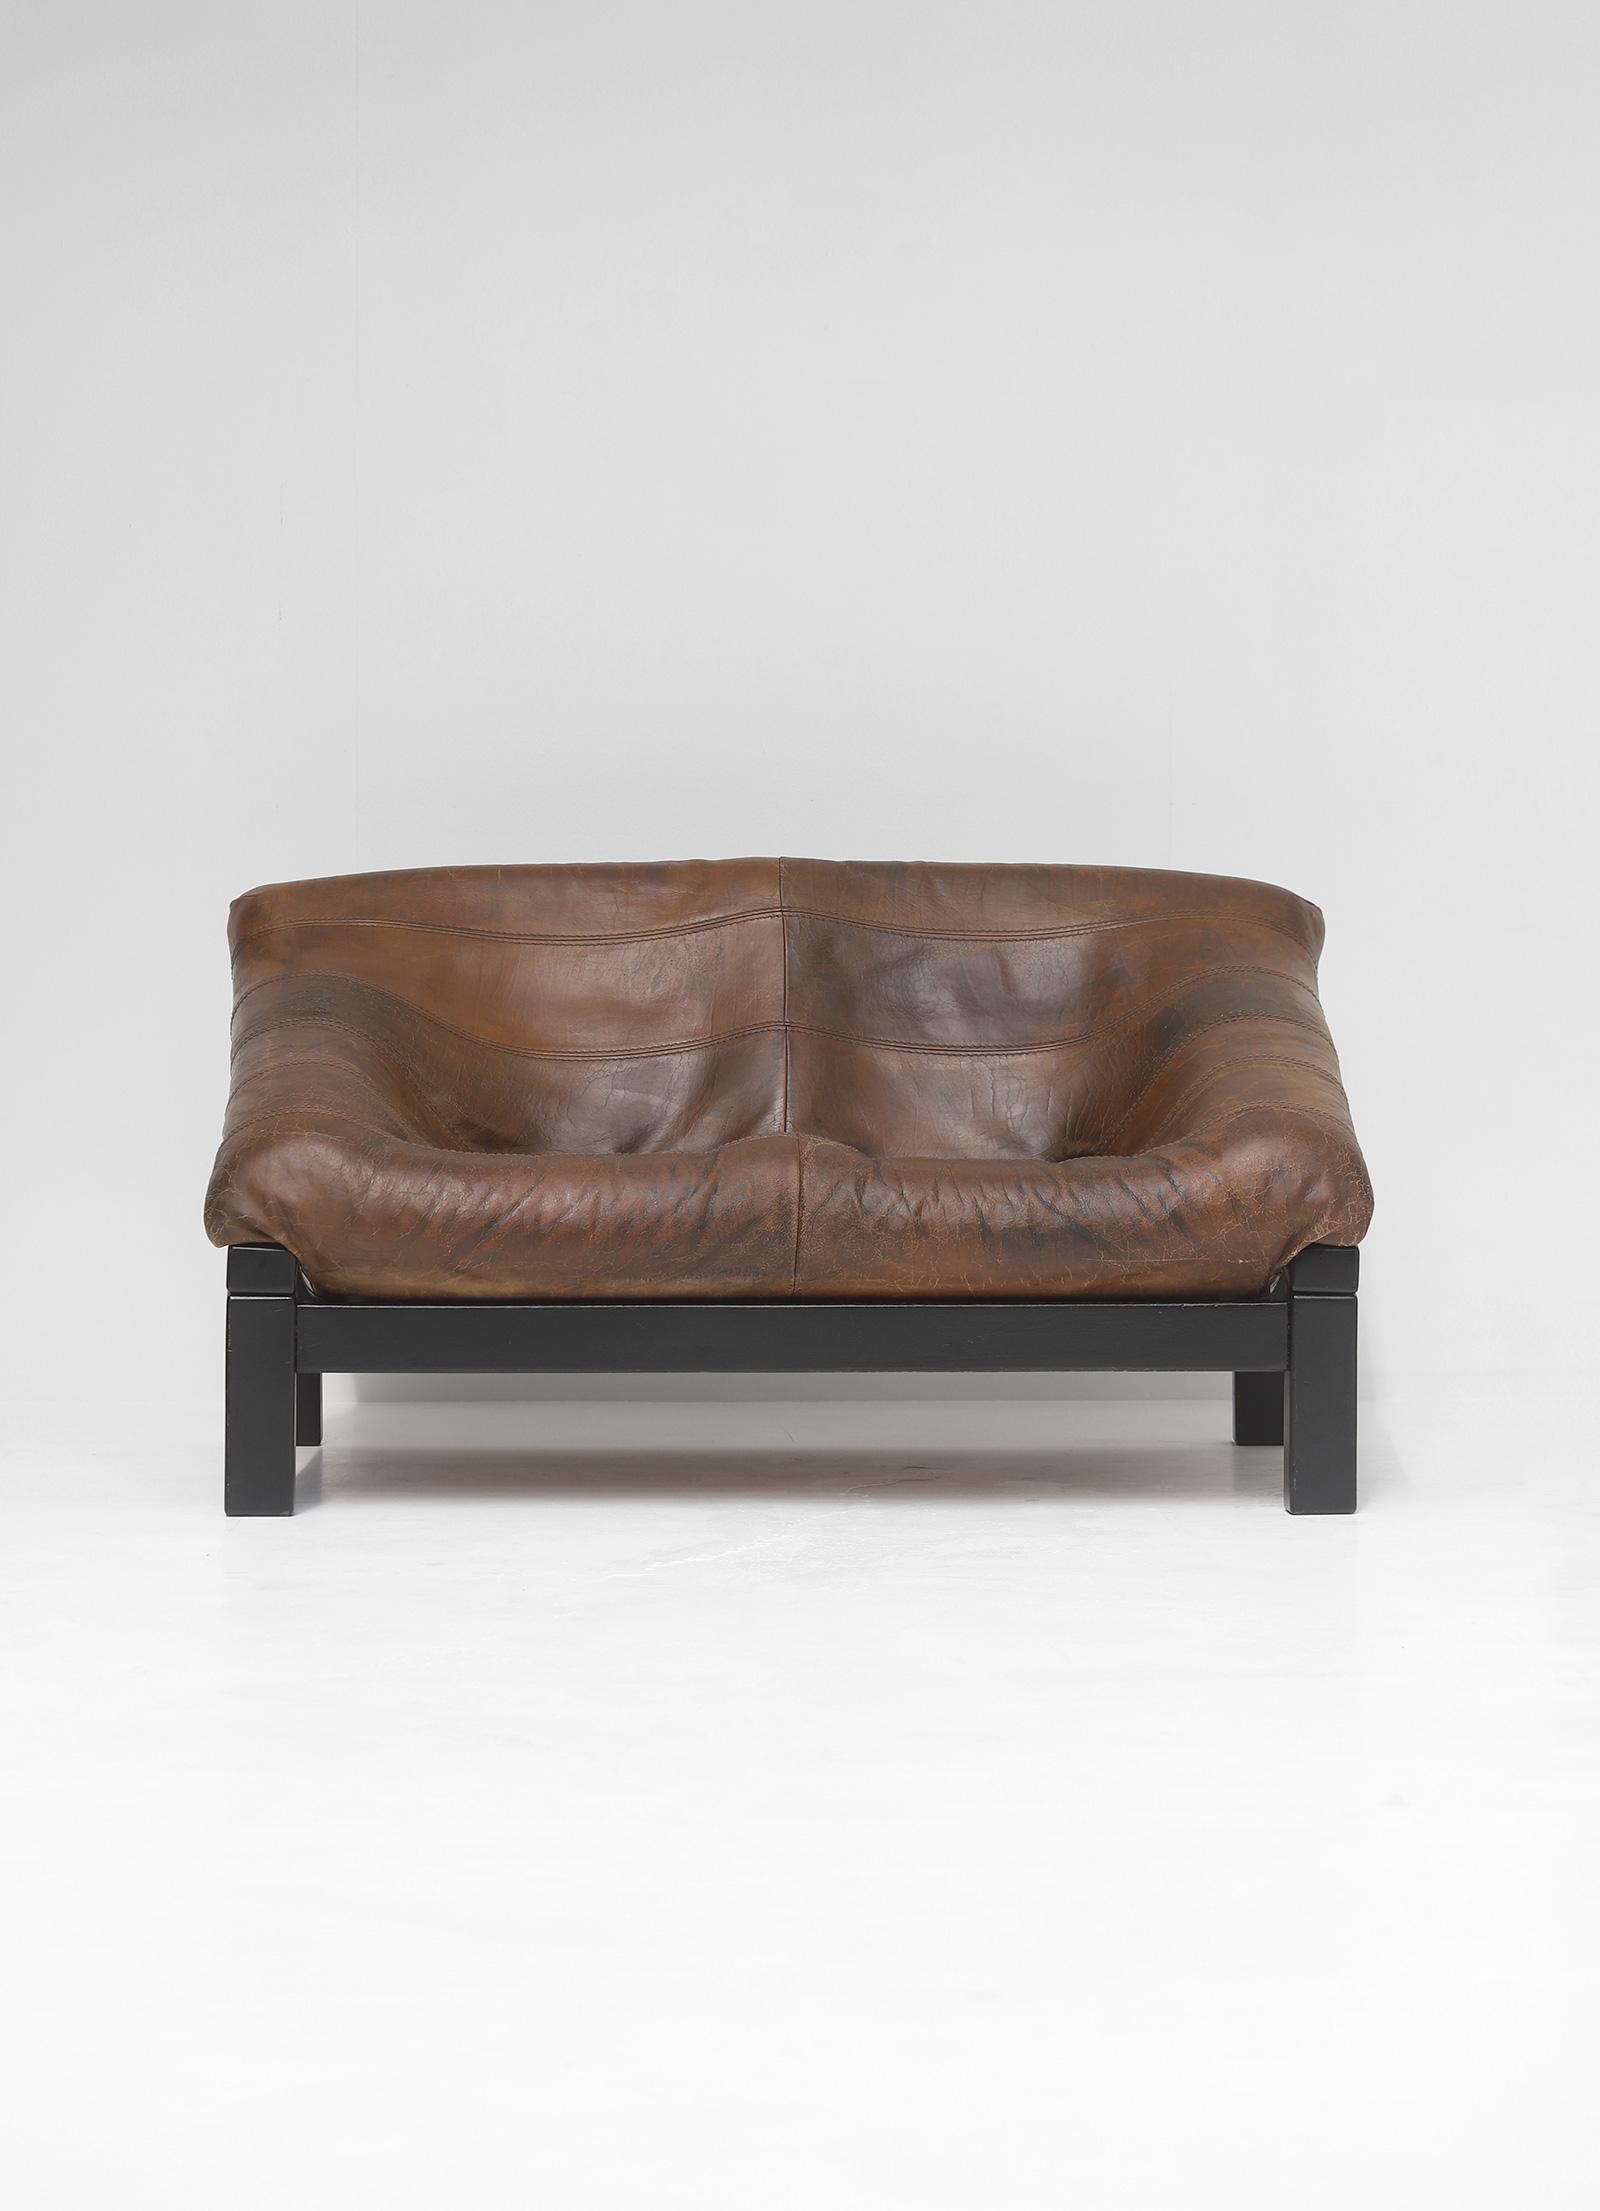 Decorative 2 seat leather Sofaimage 2